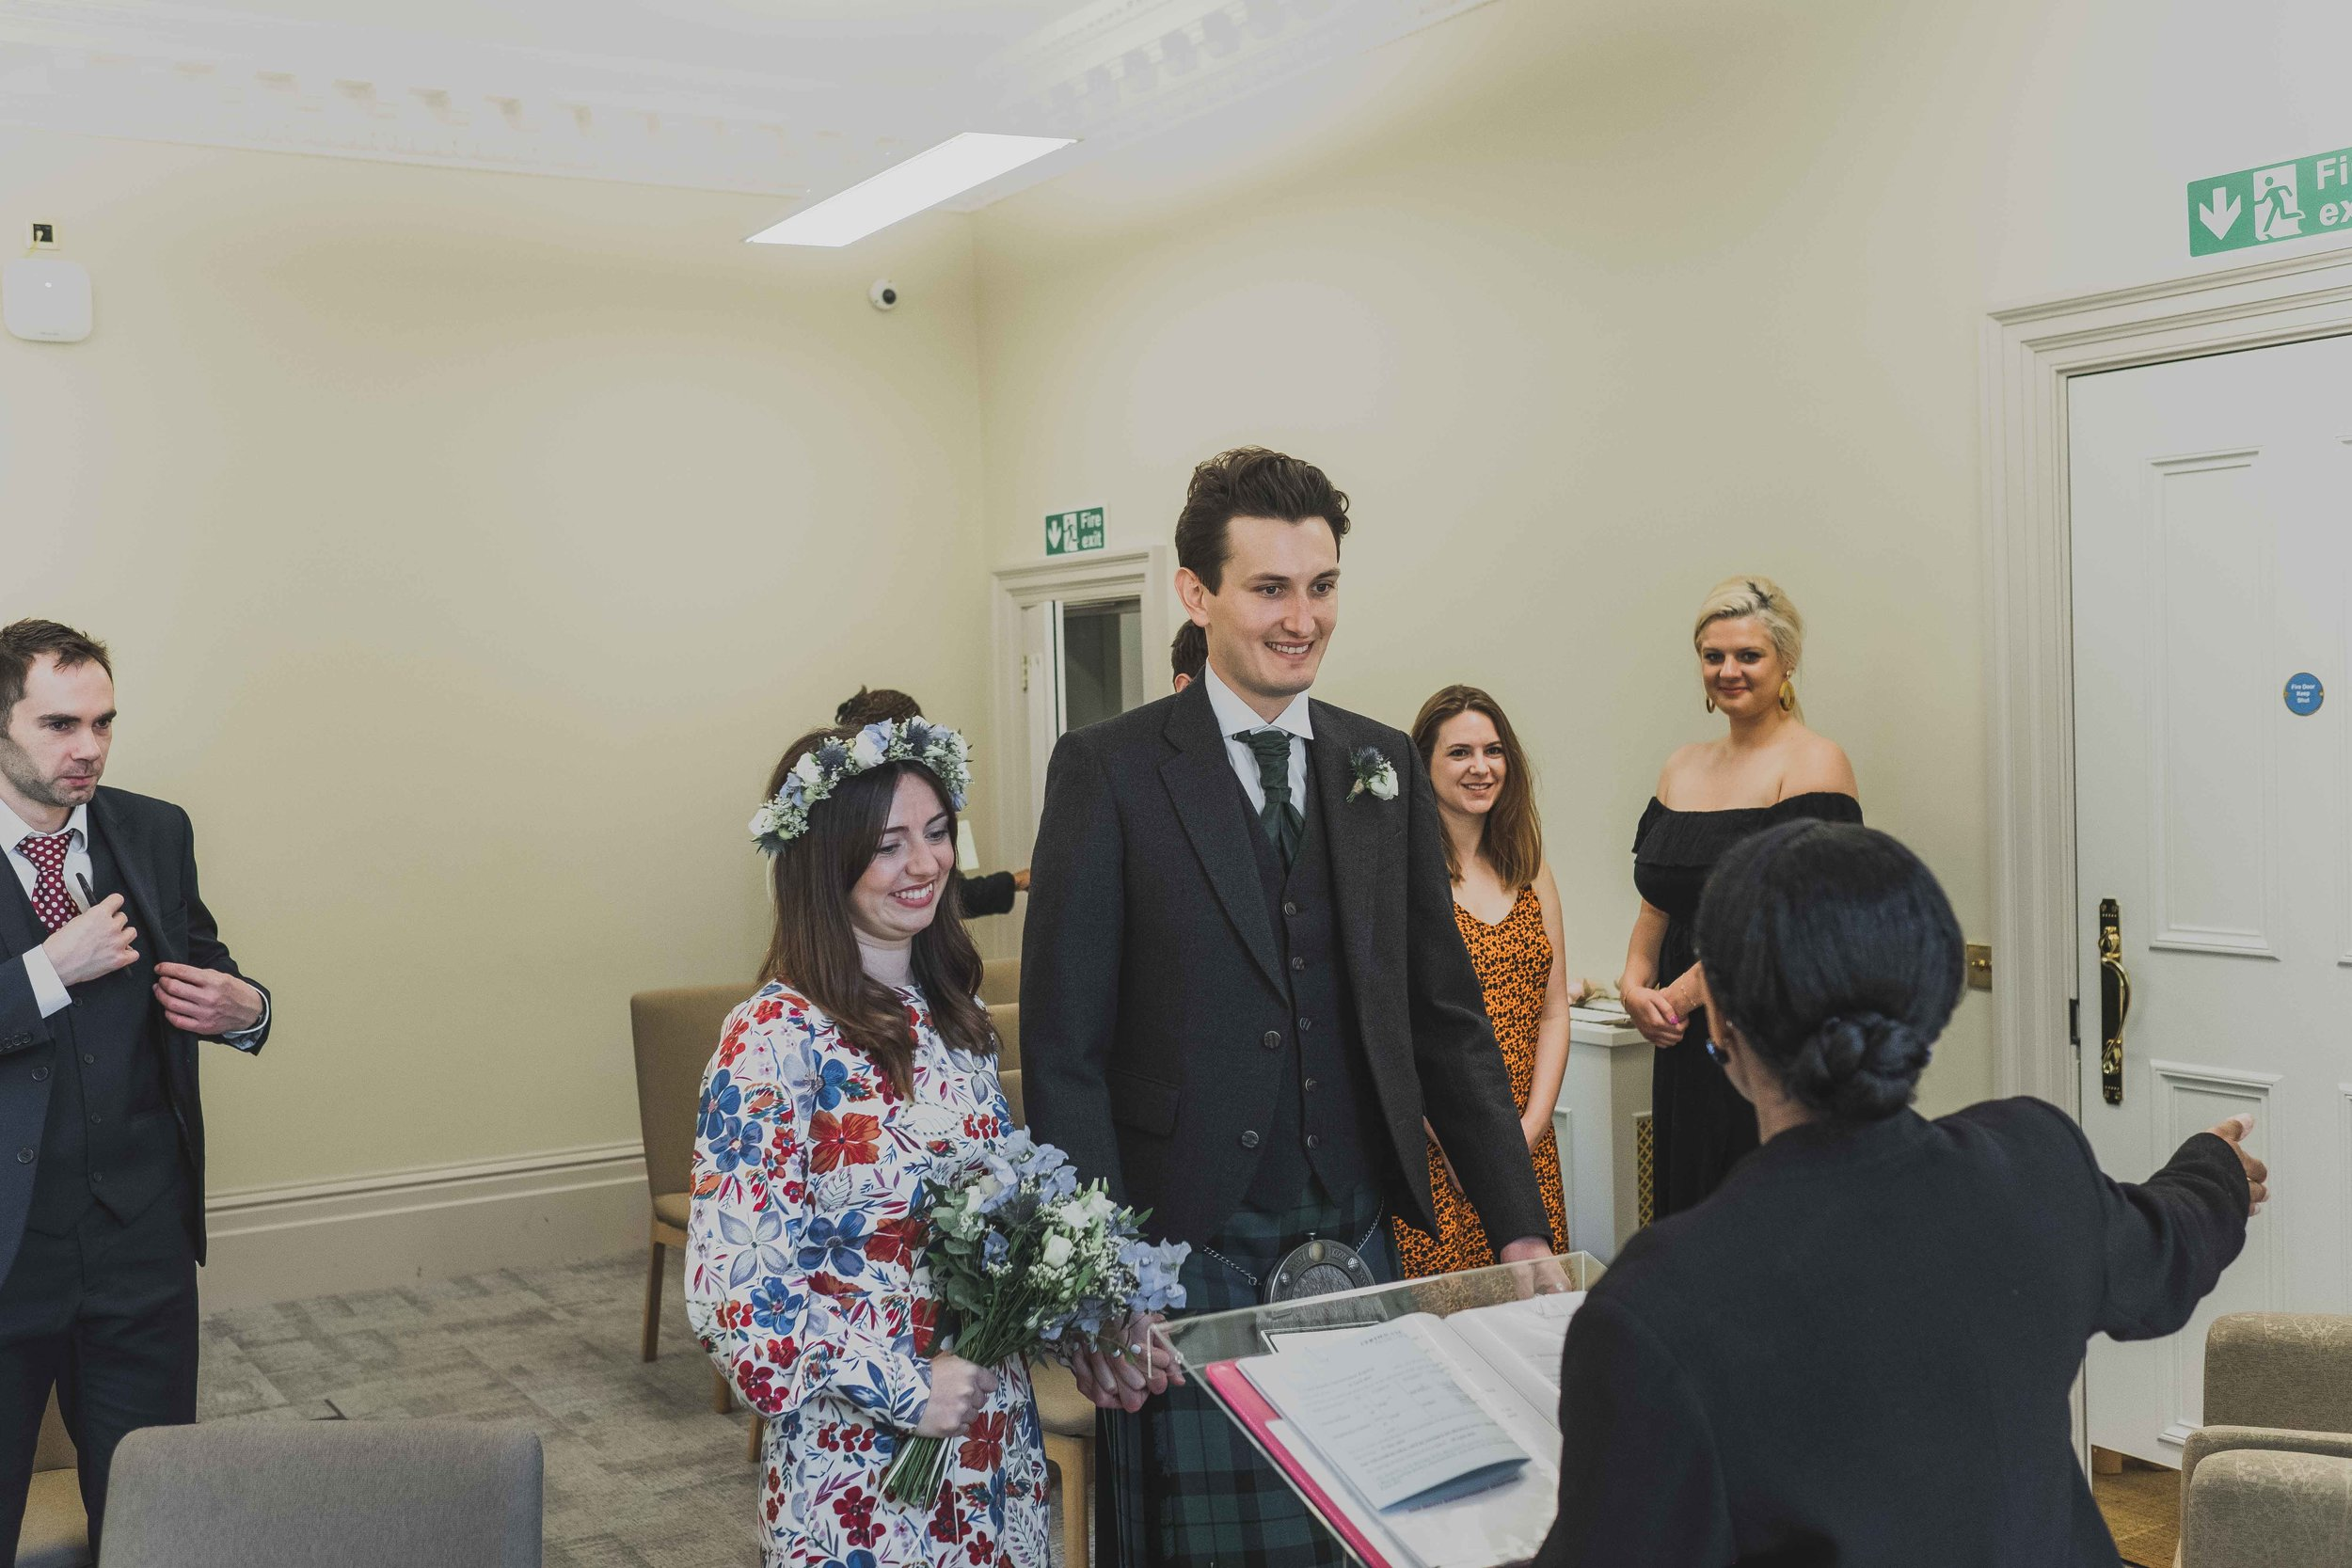 George Meehan House Wedding ceremony